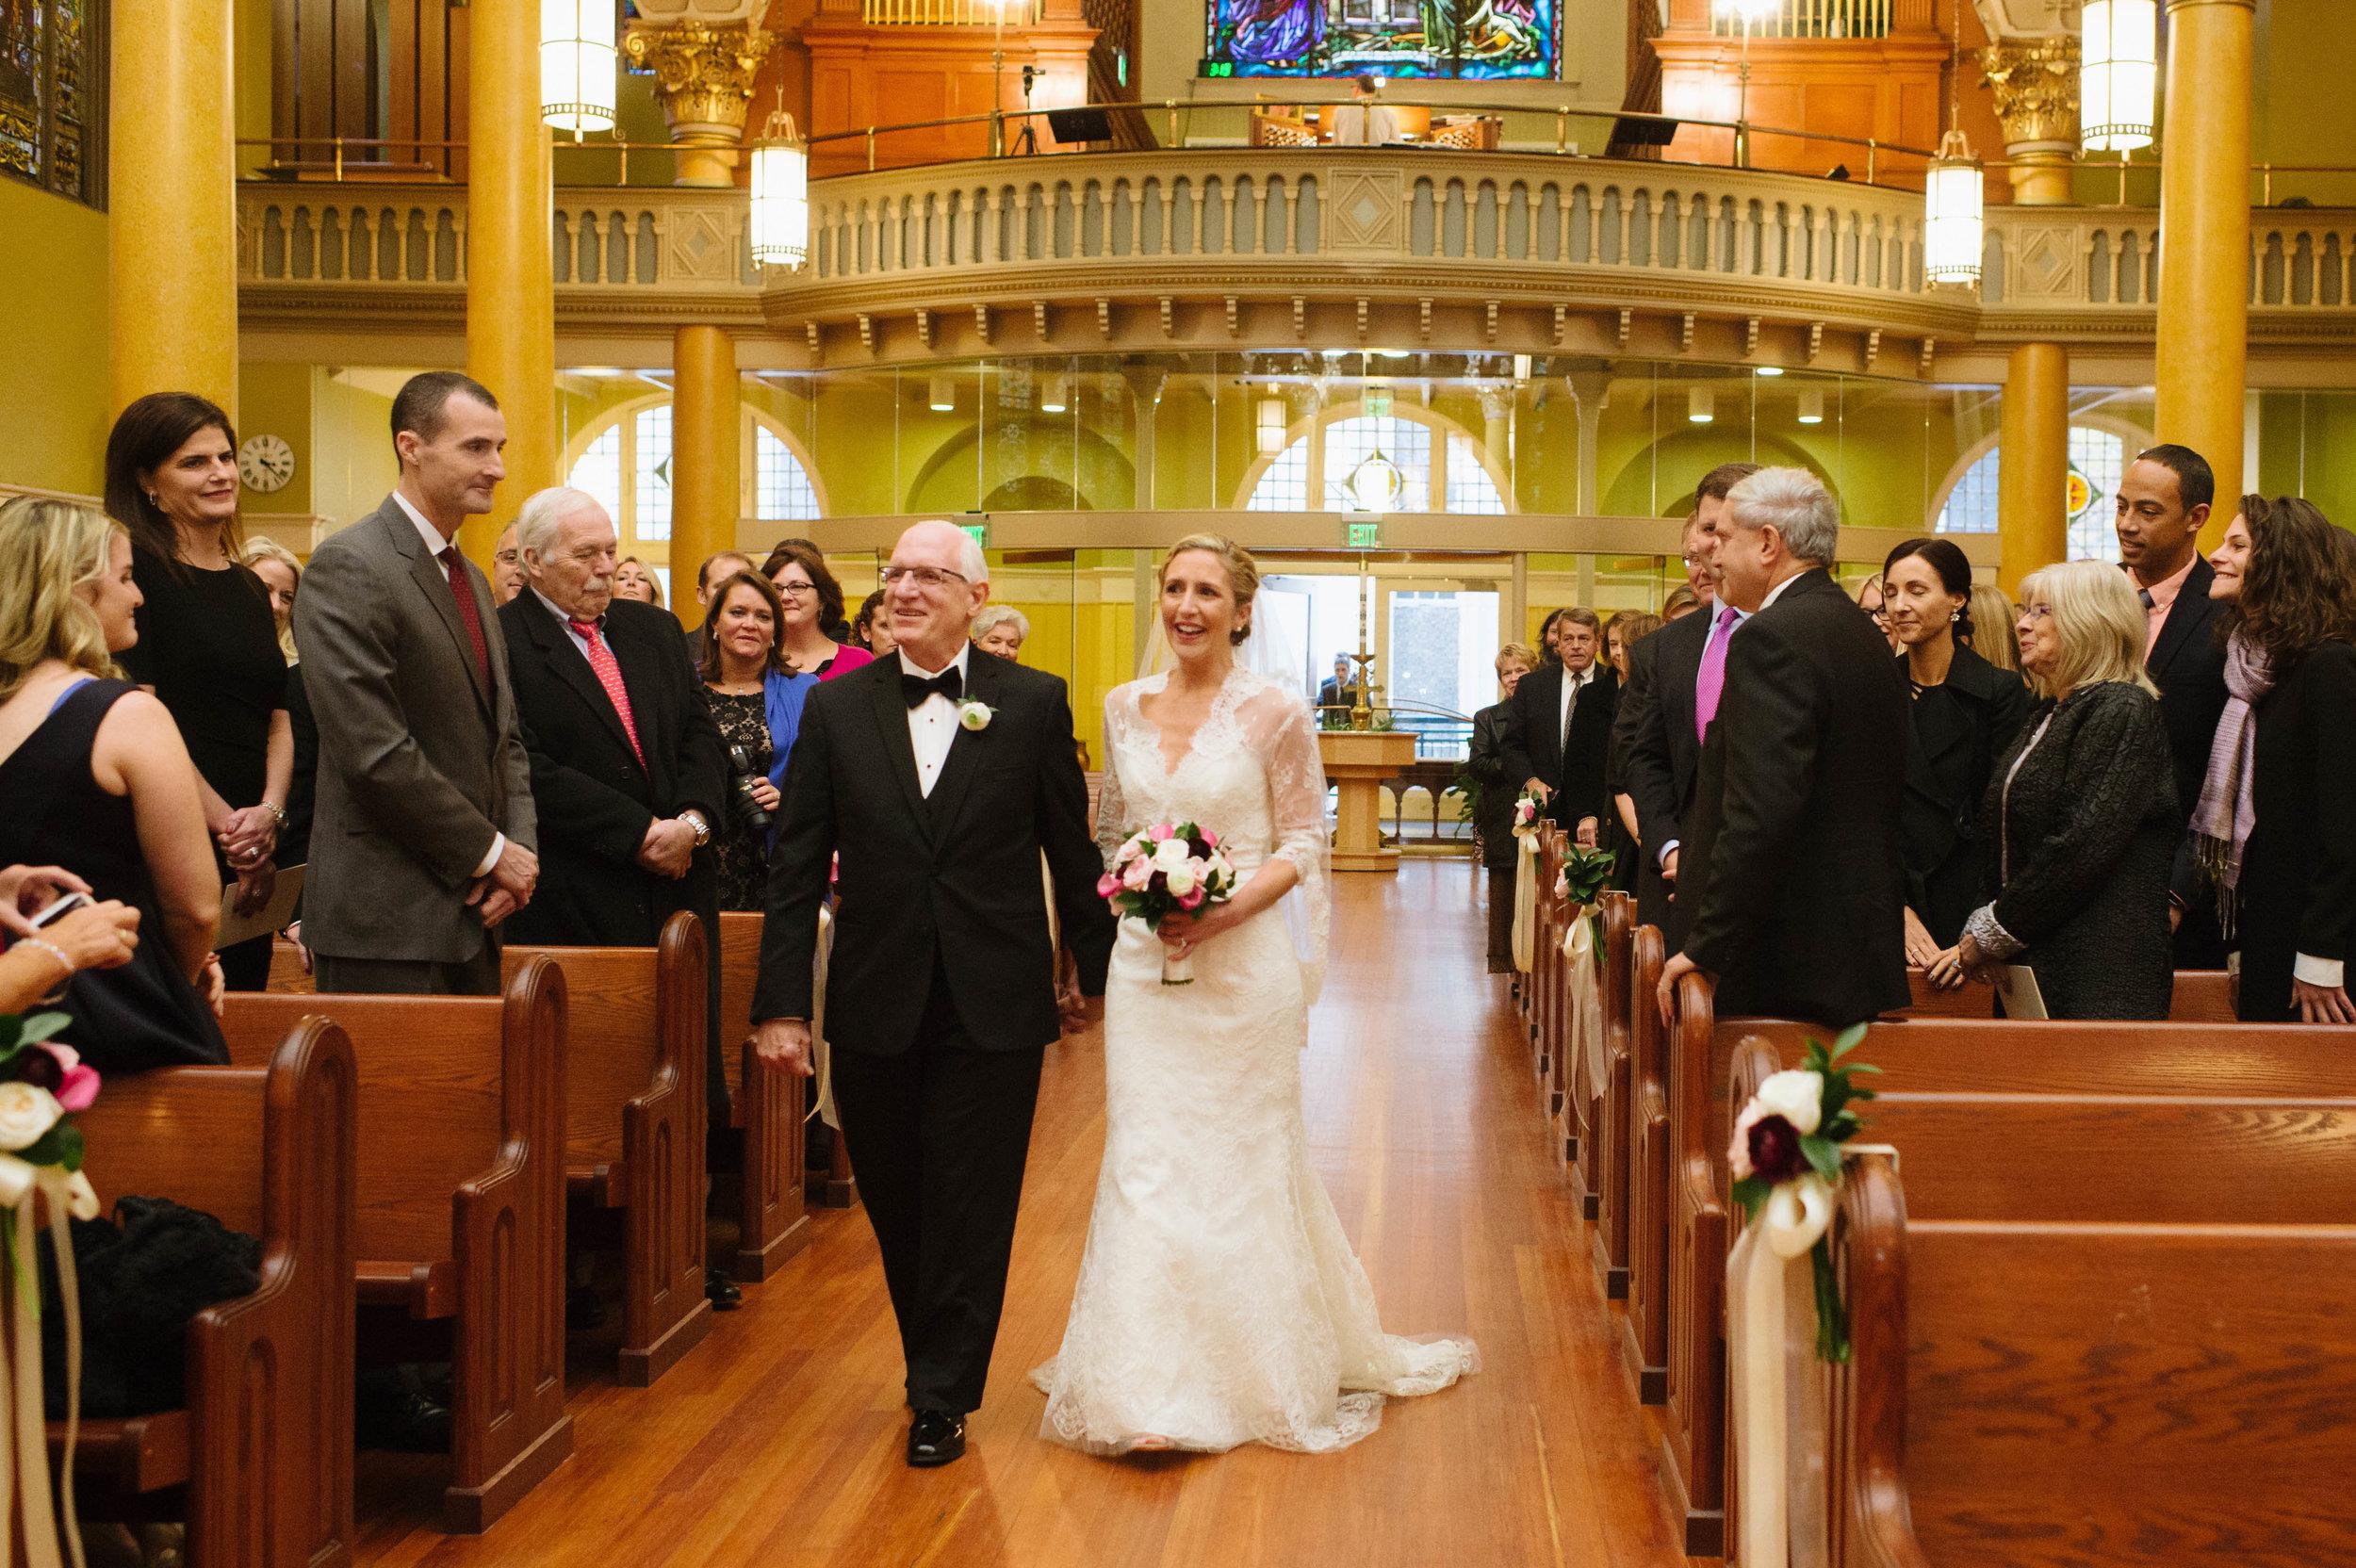 Creative-Wedding-Photography-Boston34.jpg